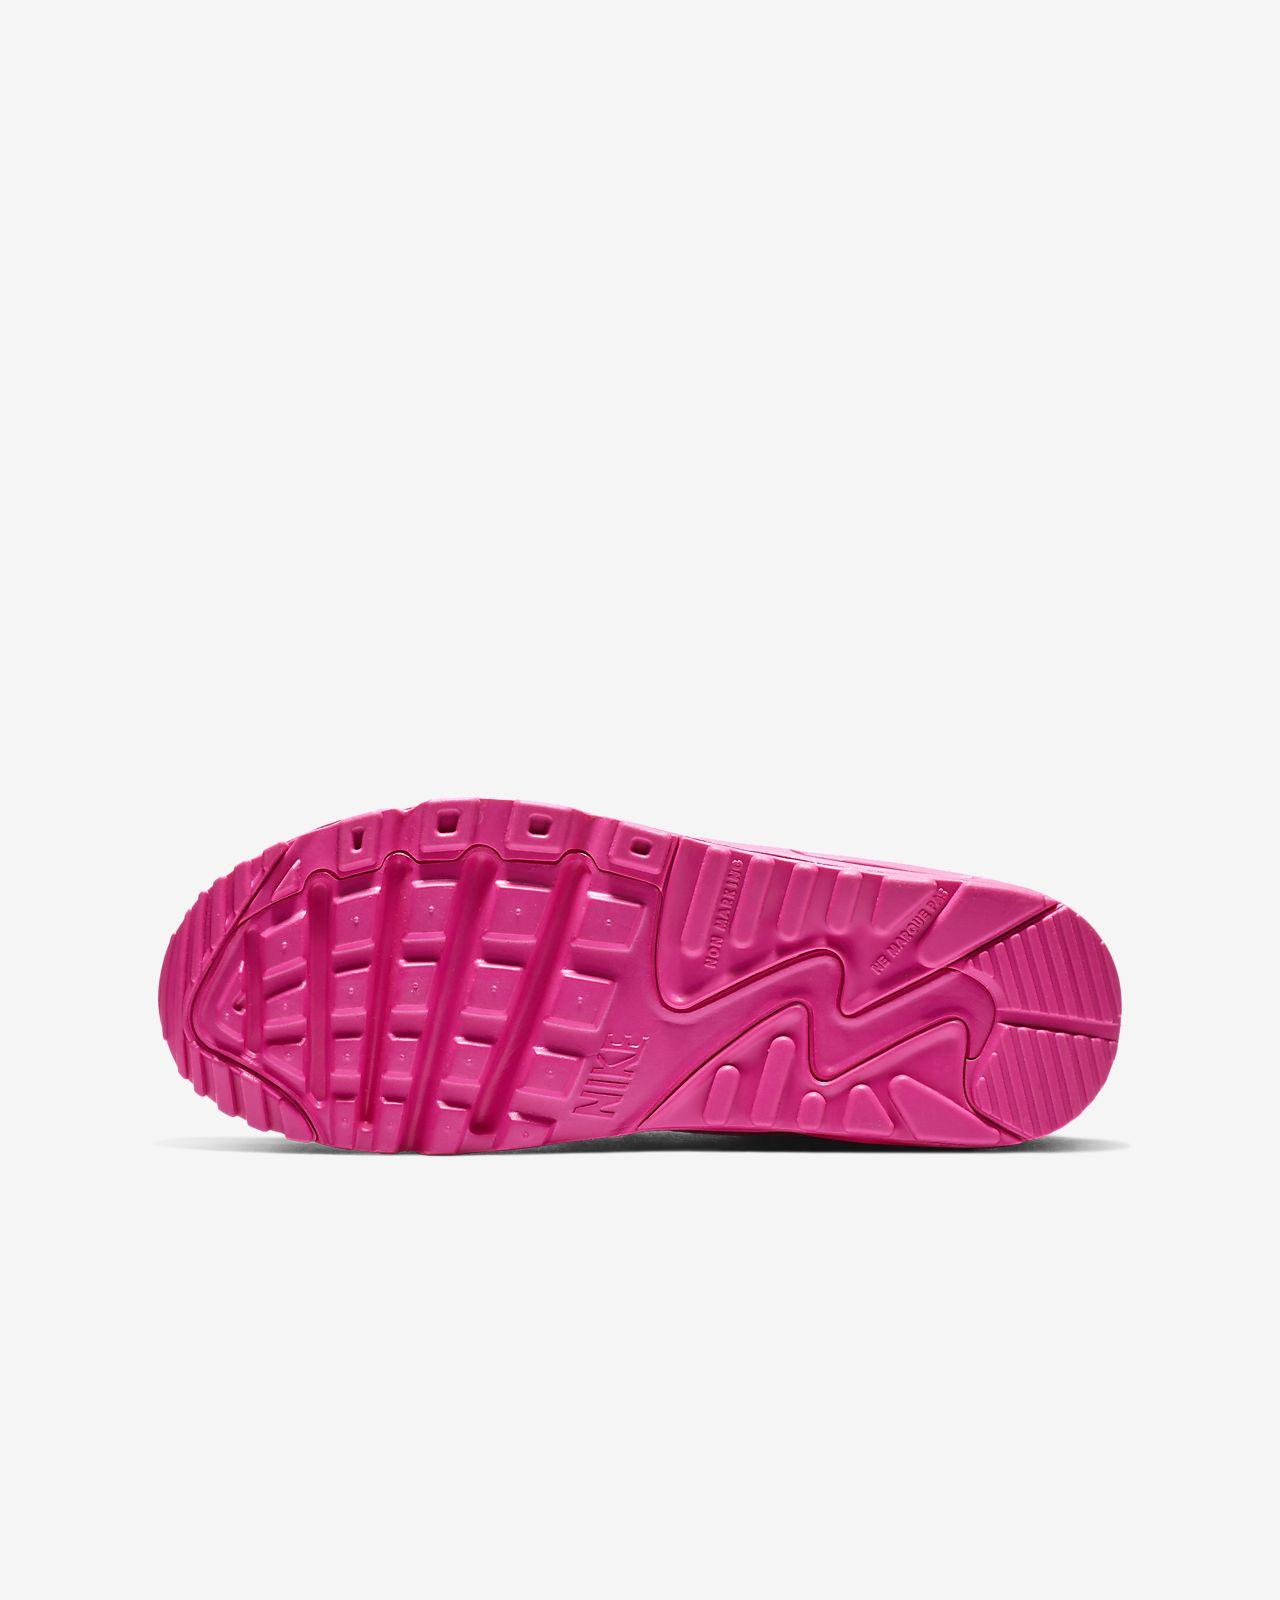 finest selection 3696e 5e69c ... Nike Air Max 90 Leather Big Kids  Shoe